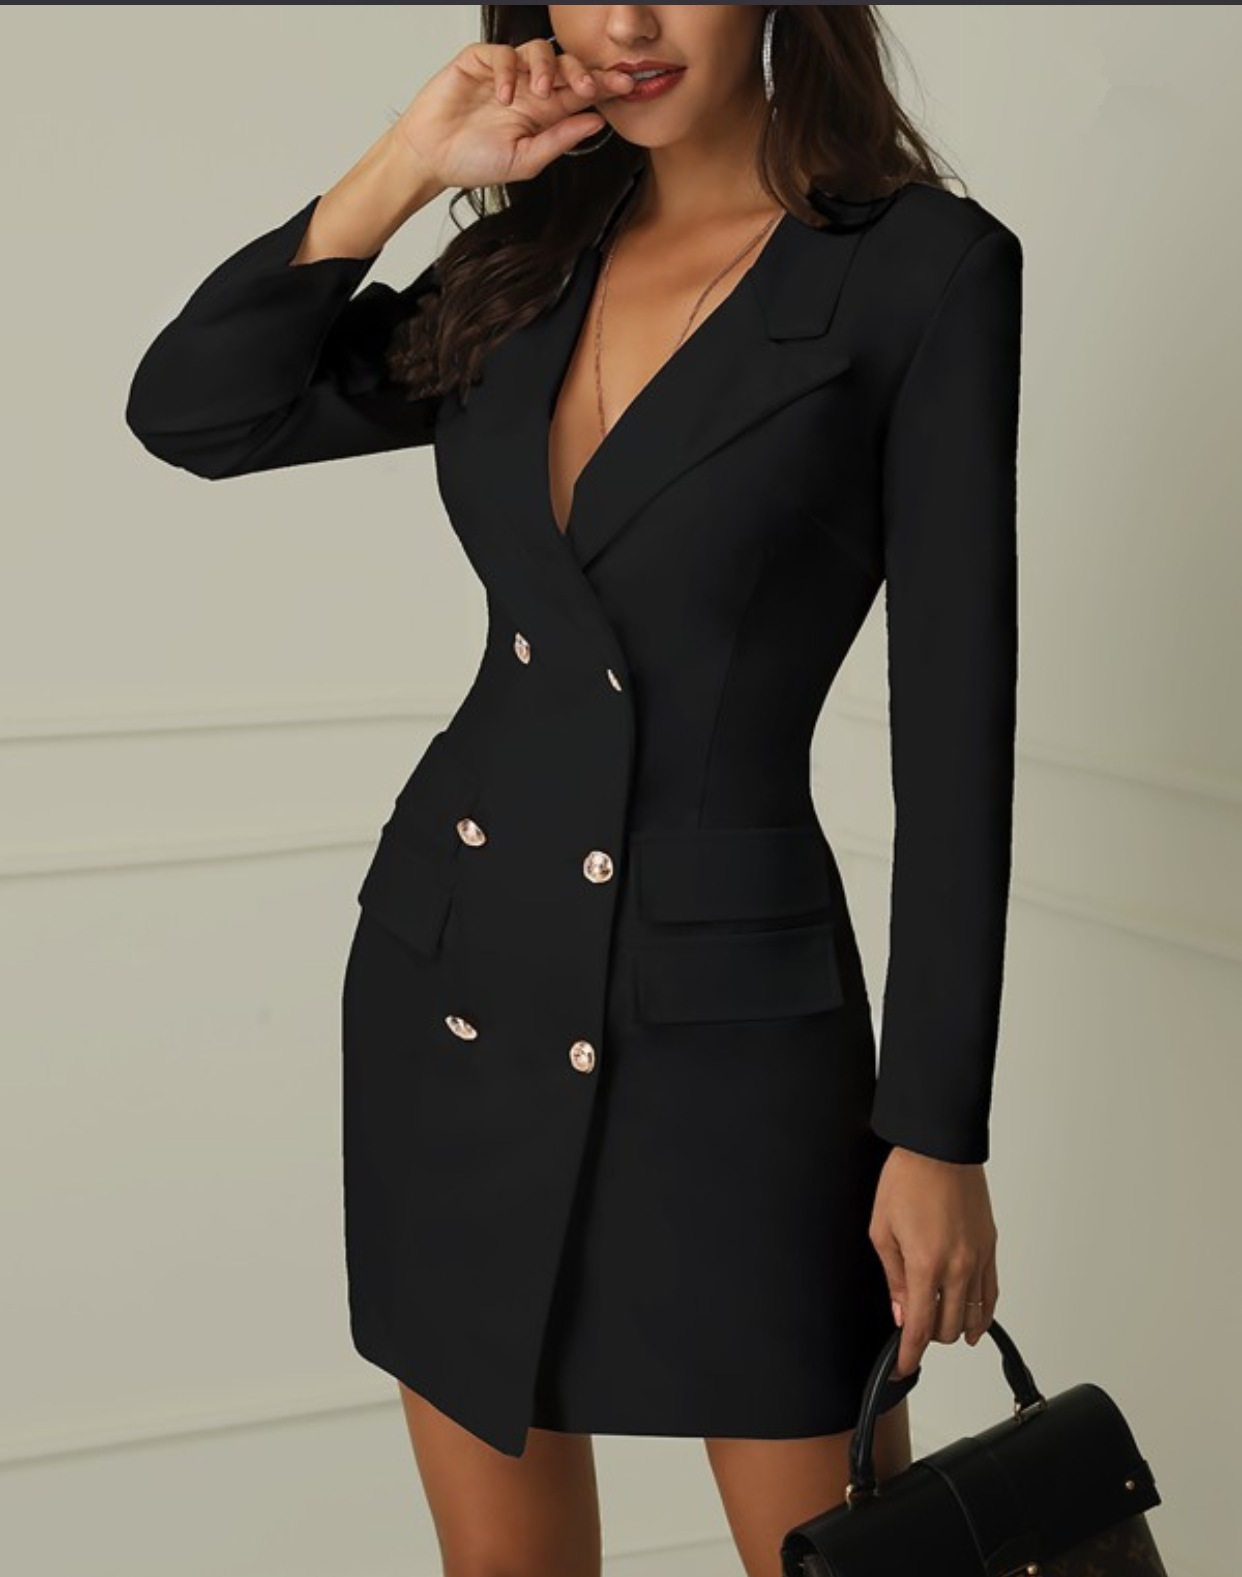 Autumn Winter Suit Blazer Womens Casual Double Breasted Women Long Pocket Jackets Elegant Long Sleeve Outerwear Jacket Long Coat